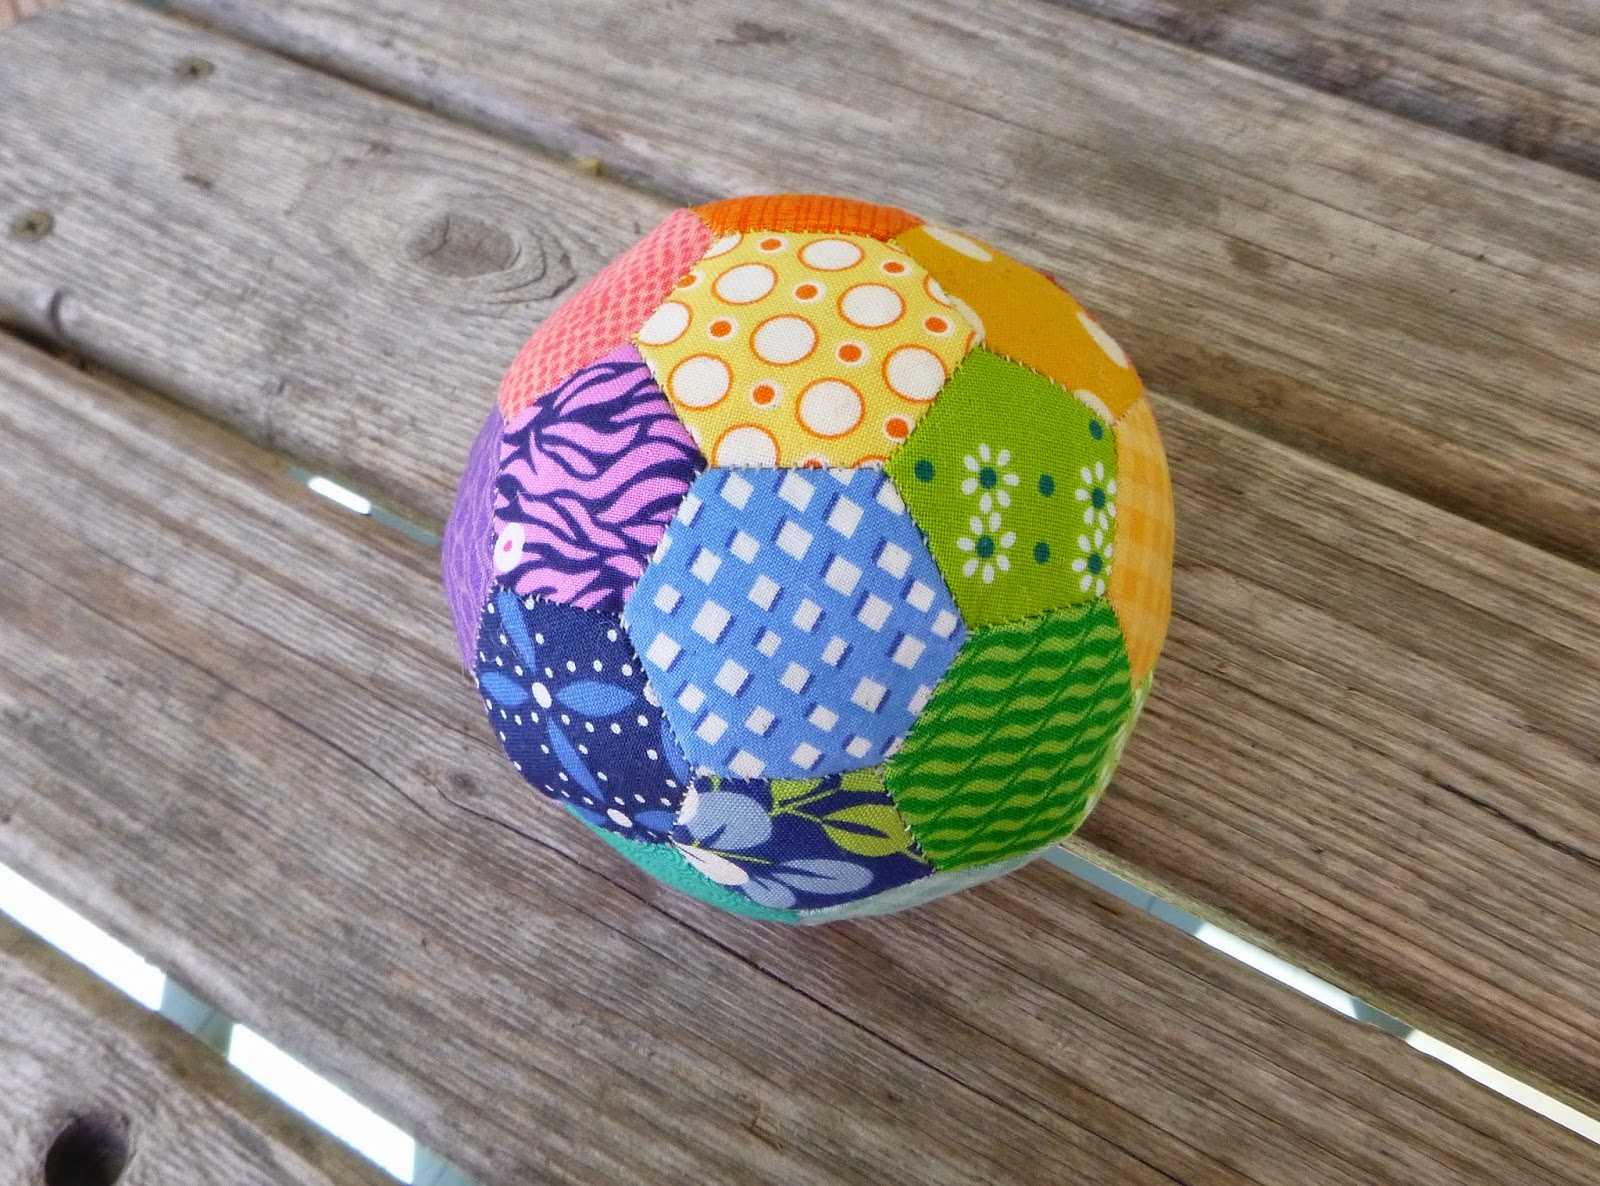 Sewn By Leila Gardunia English Paper Pieced Ball